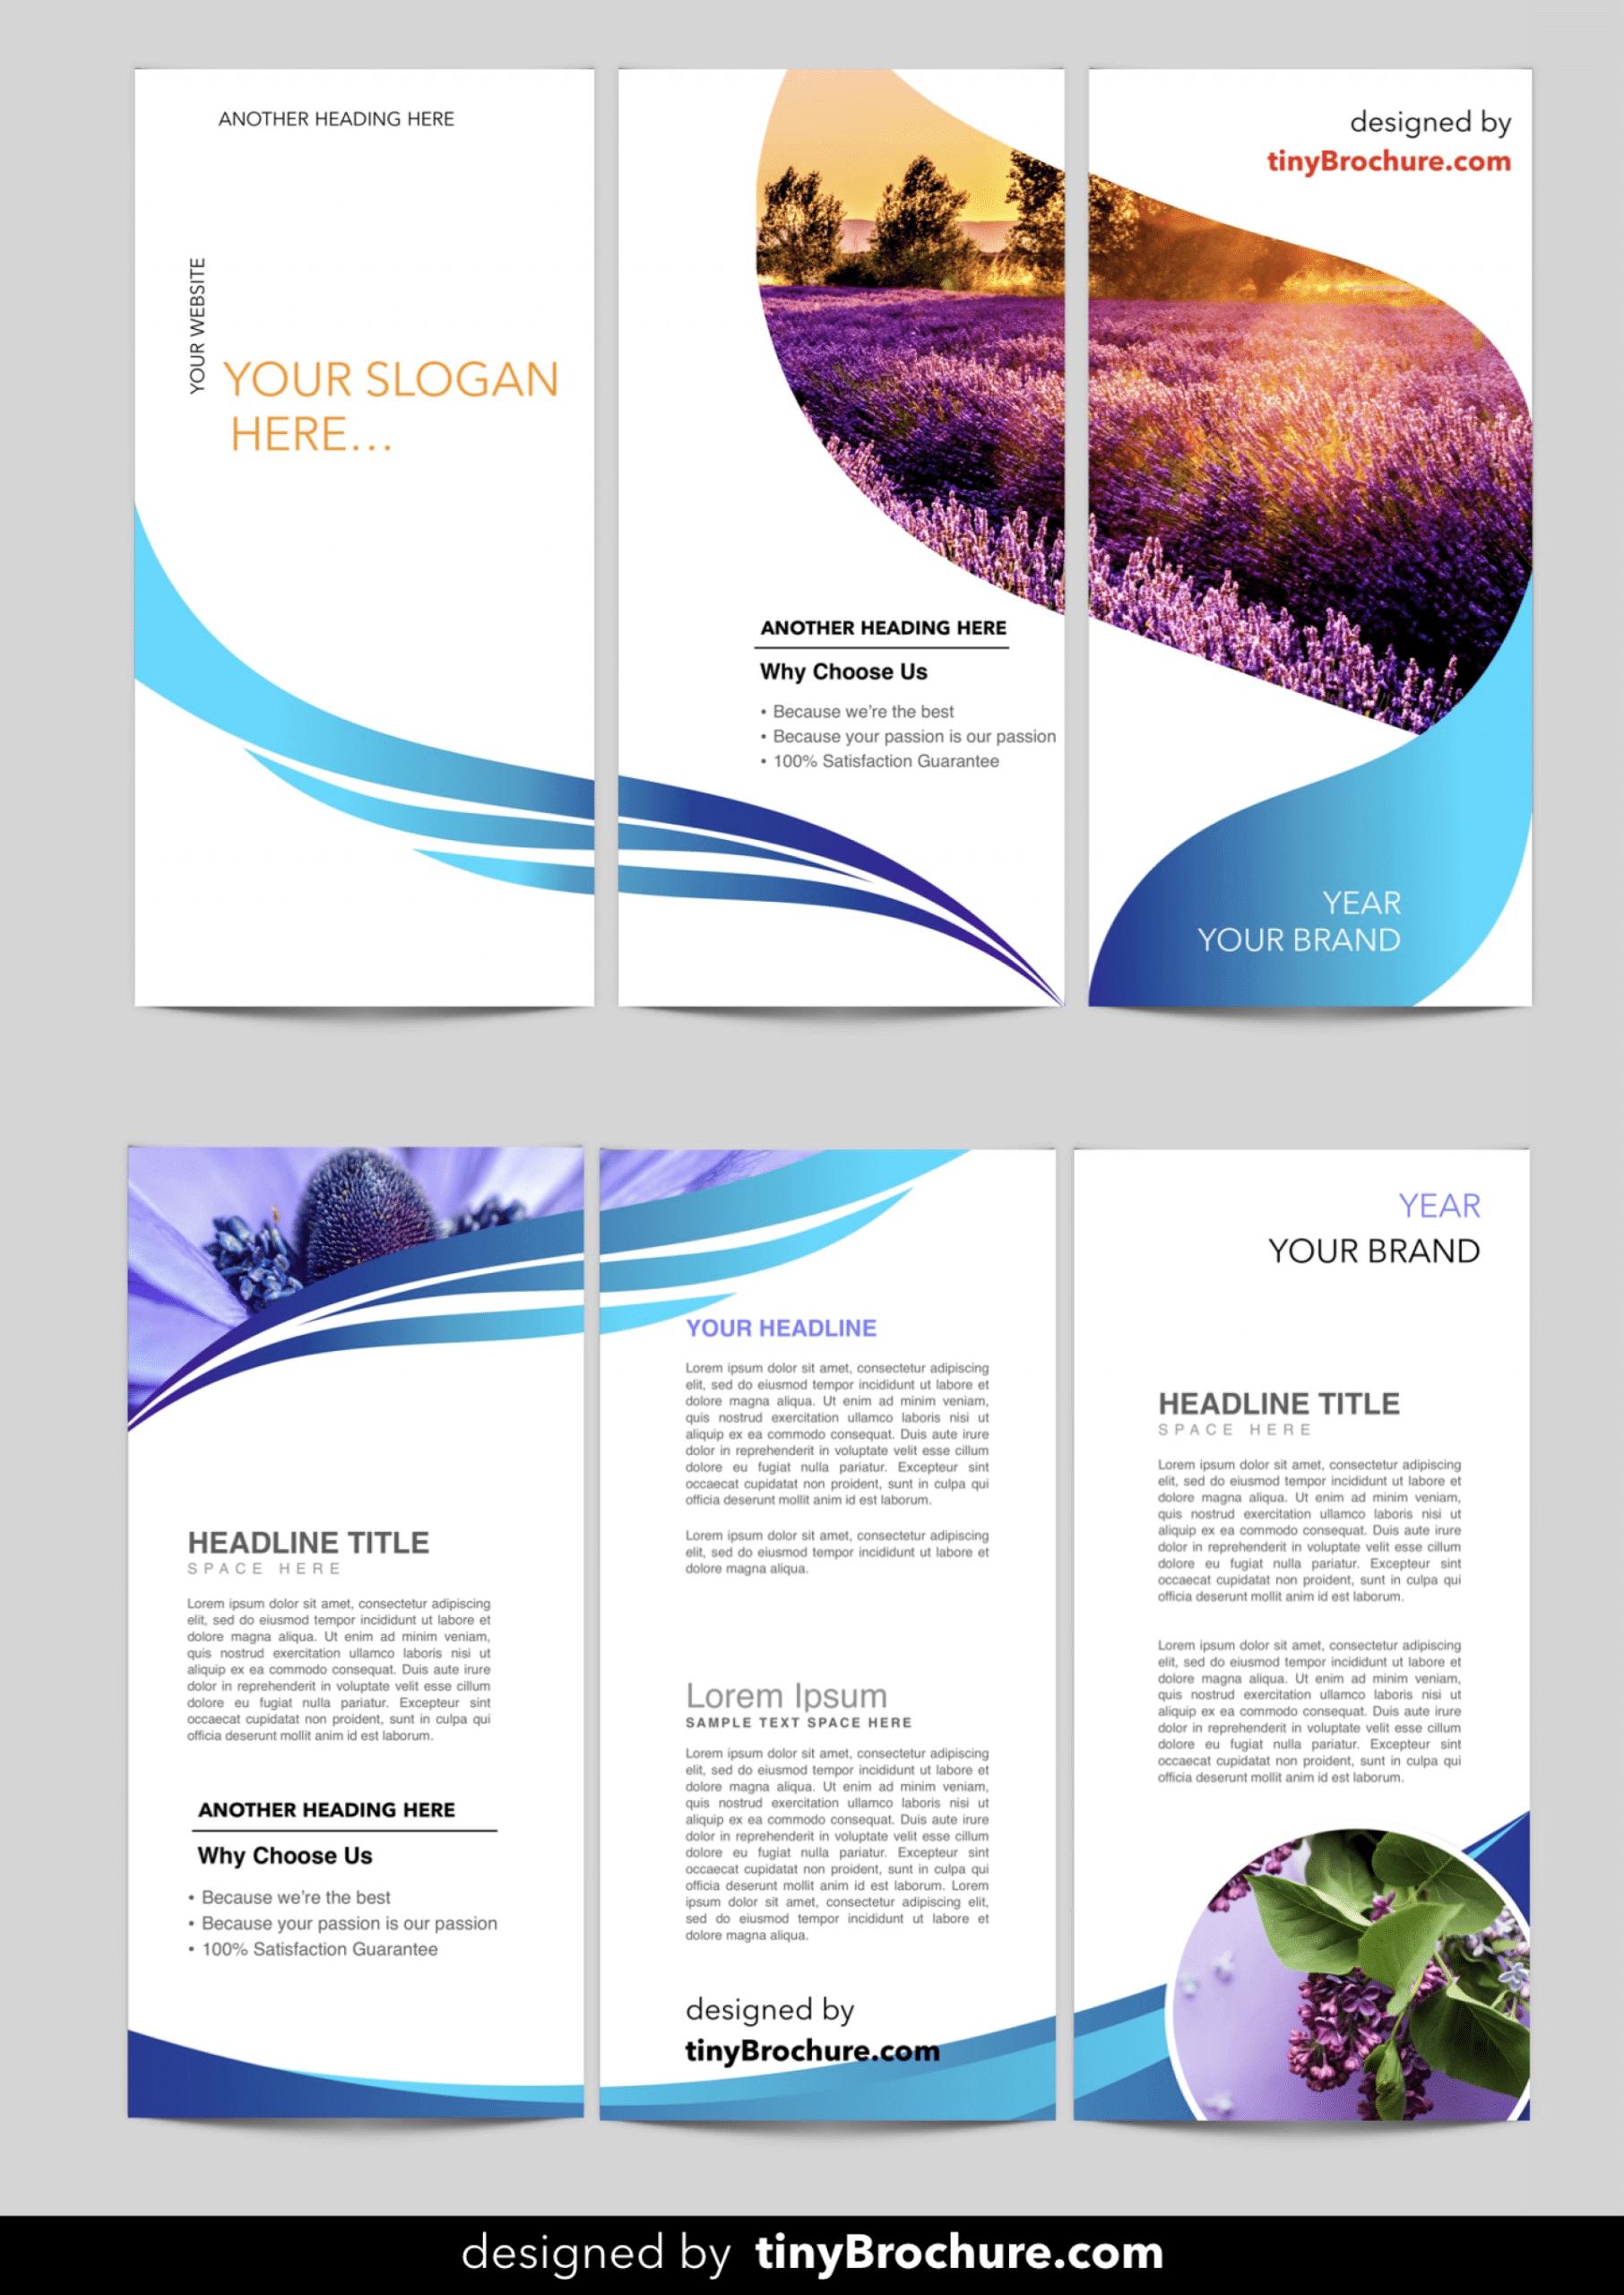 012 Free Microsoft Publisher Travel Brochure Template Within Travel Brochure Template Ks2